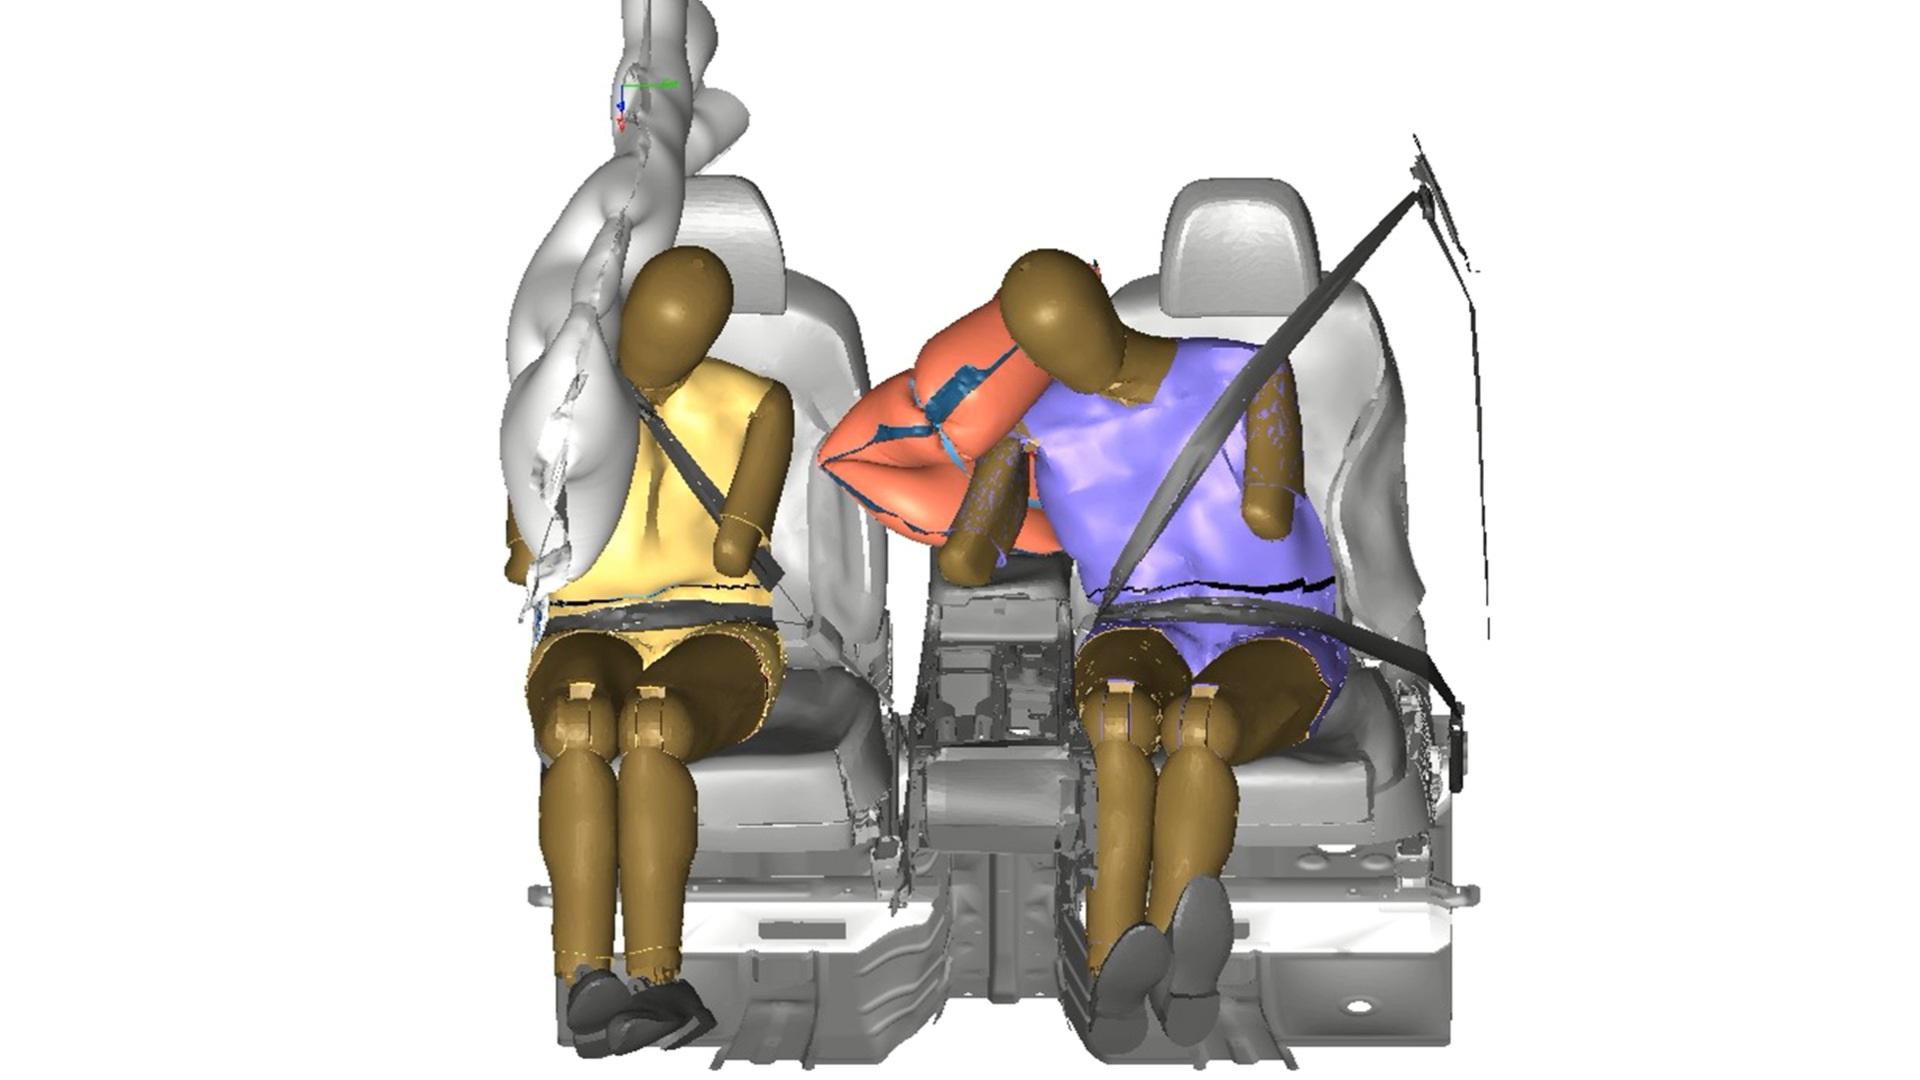 hyundai airbag lateral central (2)